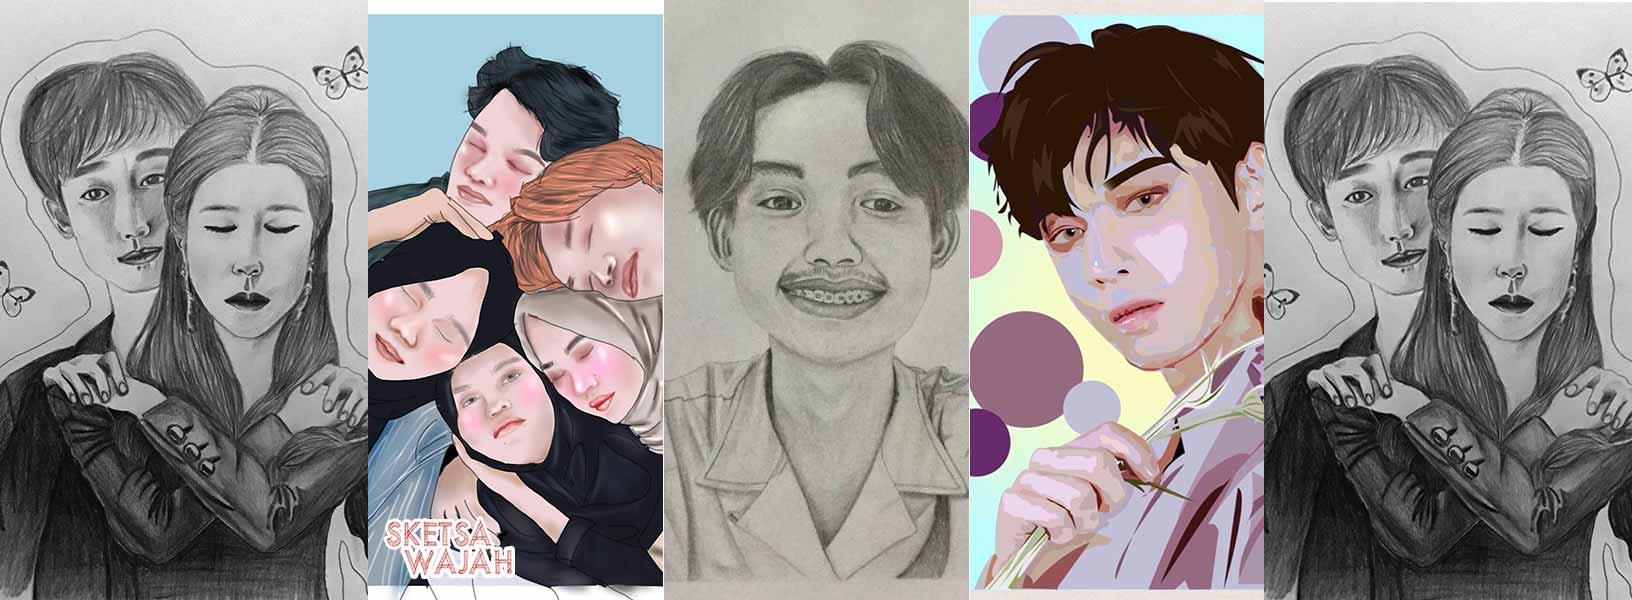 Karya Siti Faradhilla sketcher Sketsa Wajah